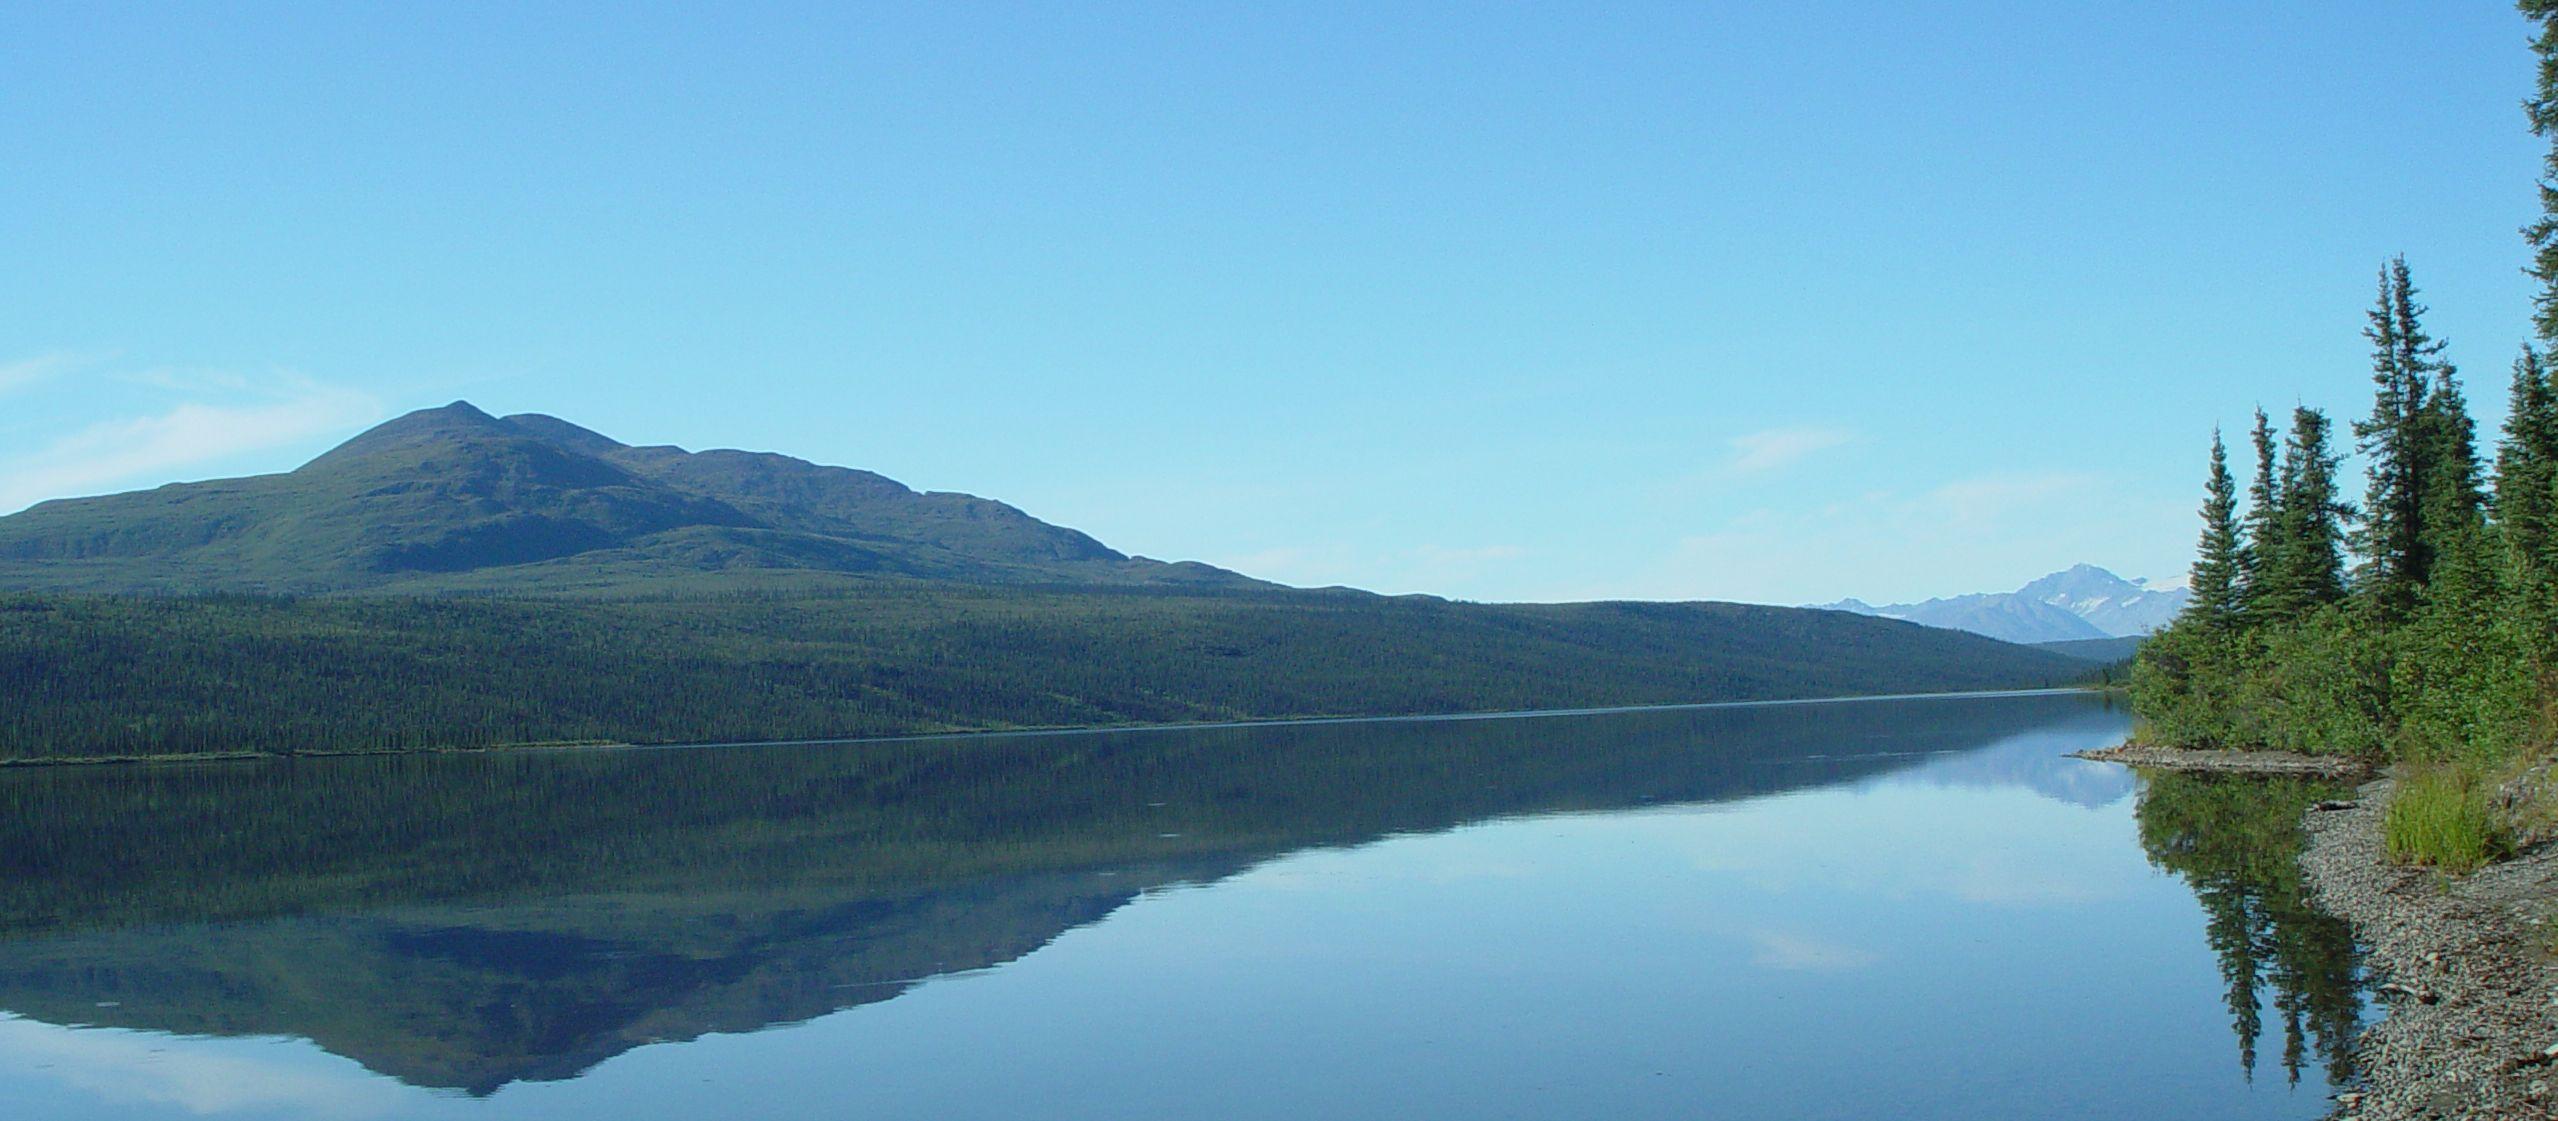 Paxson Lake in Alaska